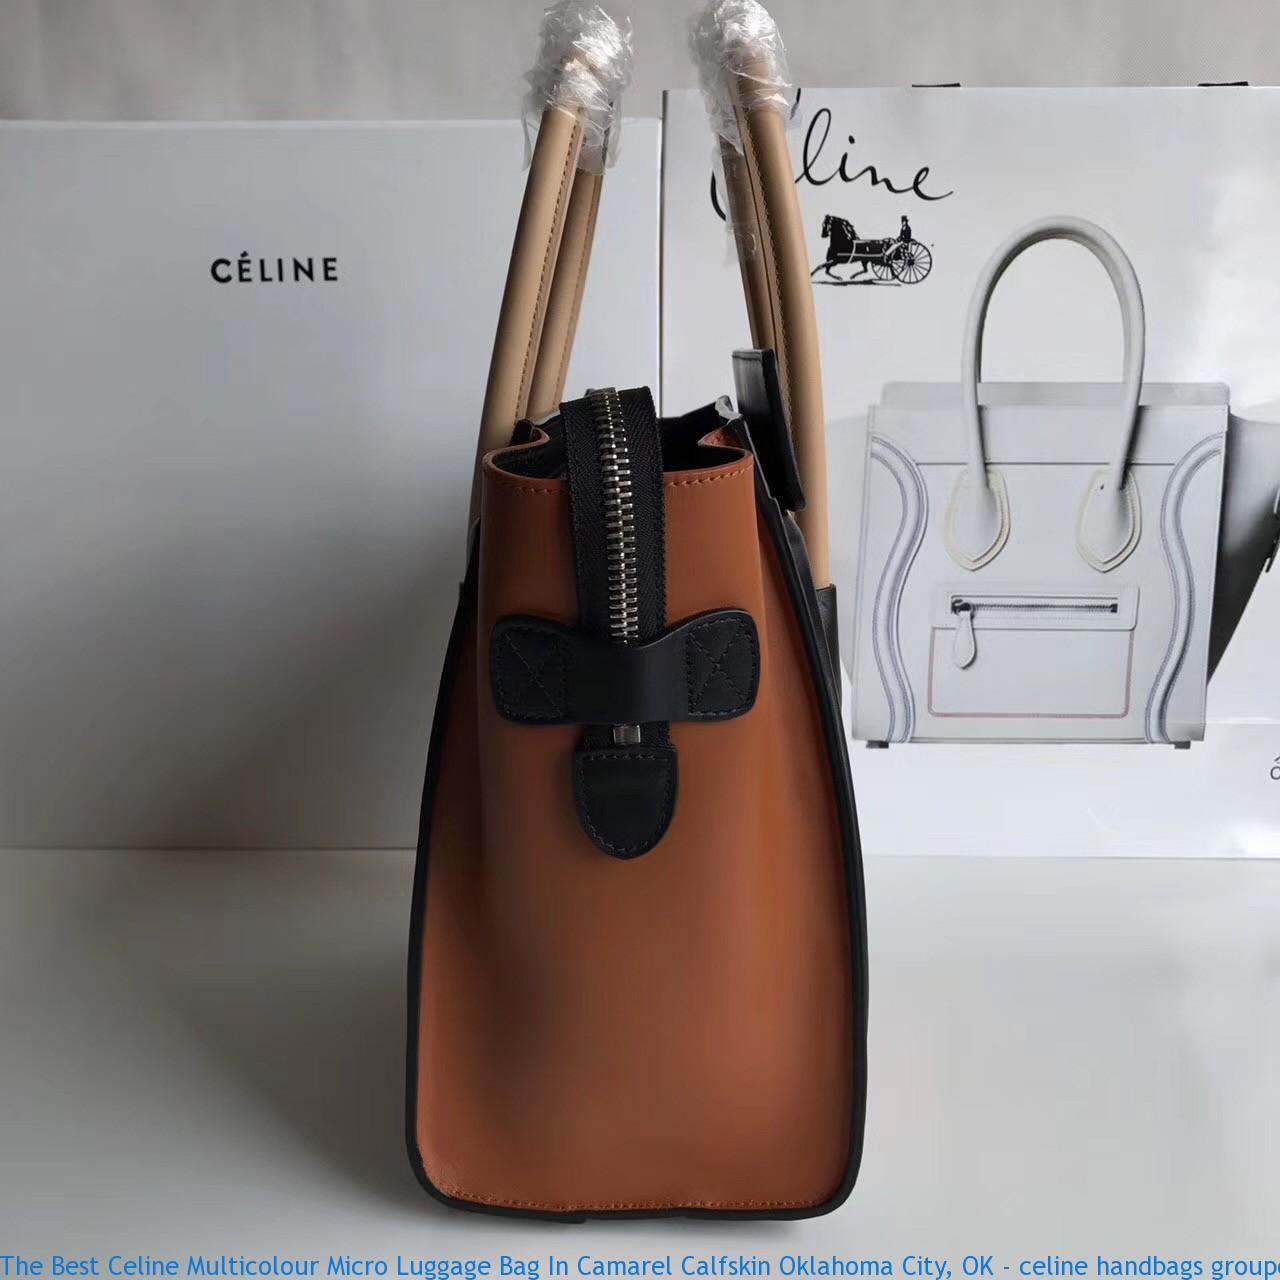 0ee6cc6243b4 The Best Celine Multicolour Micro Luggage Bag In Camarel Calfskin ...